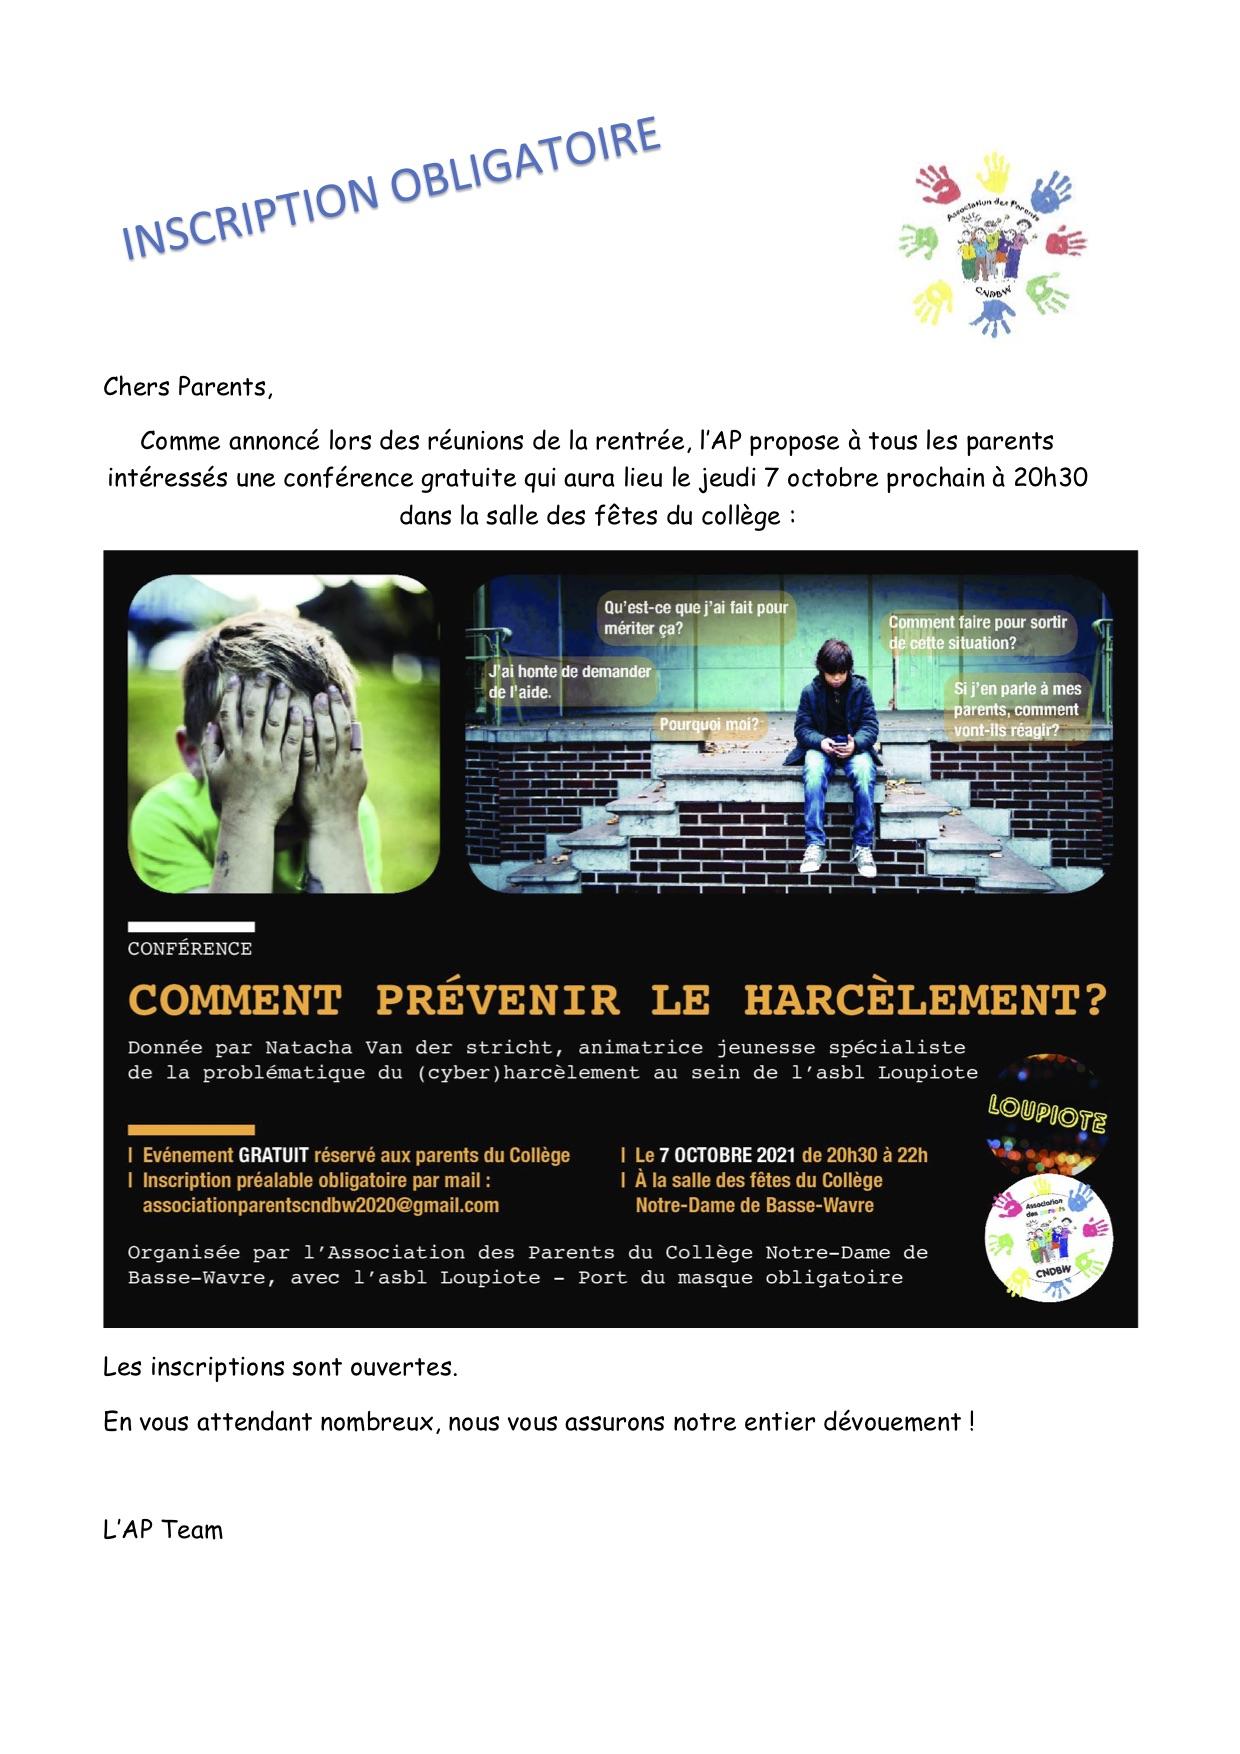 invitation conférence harcèlement